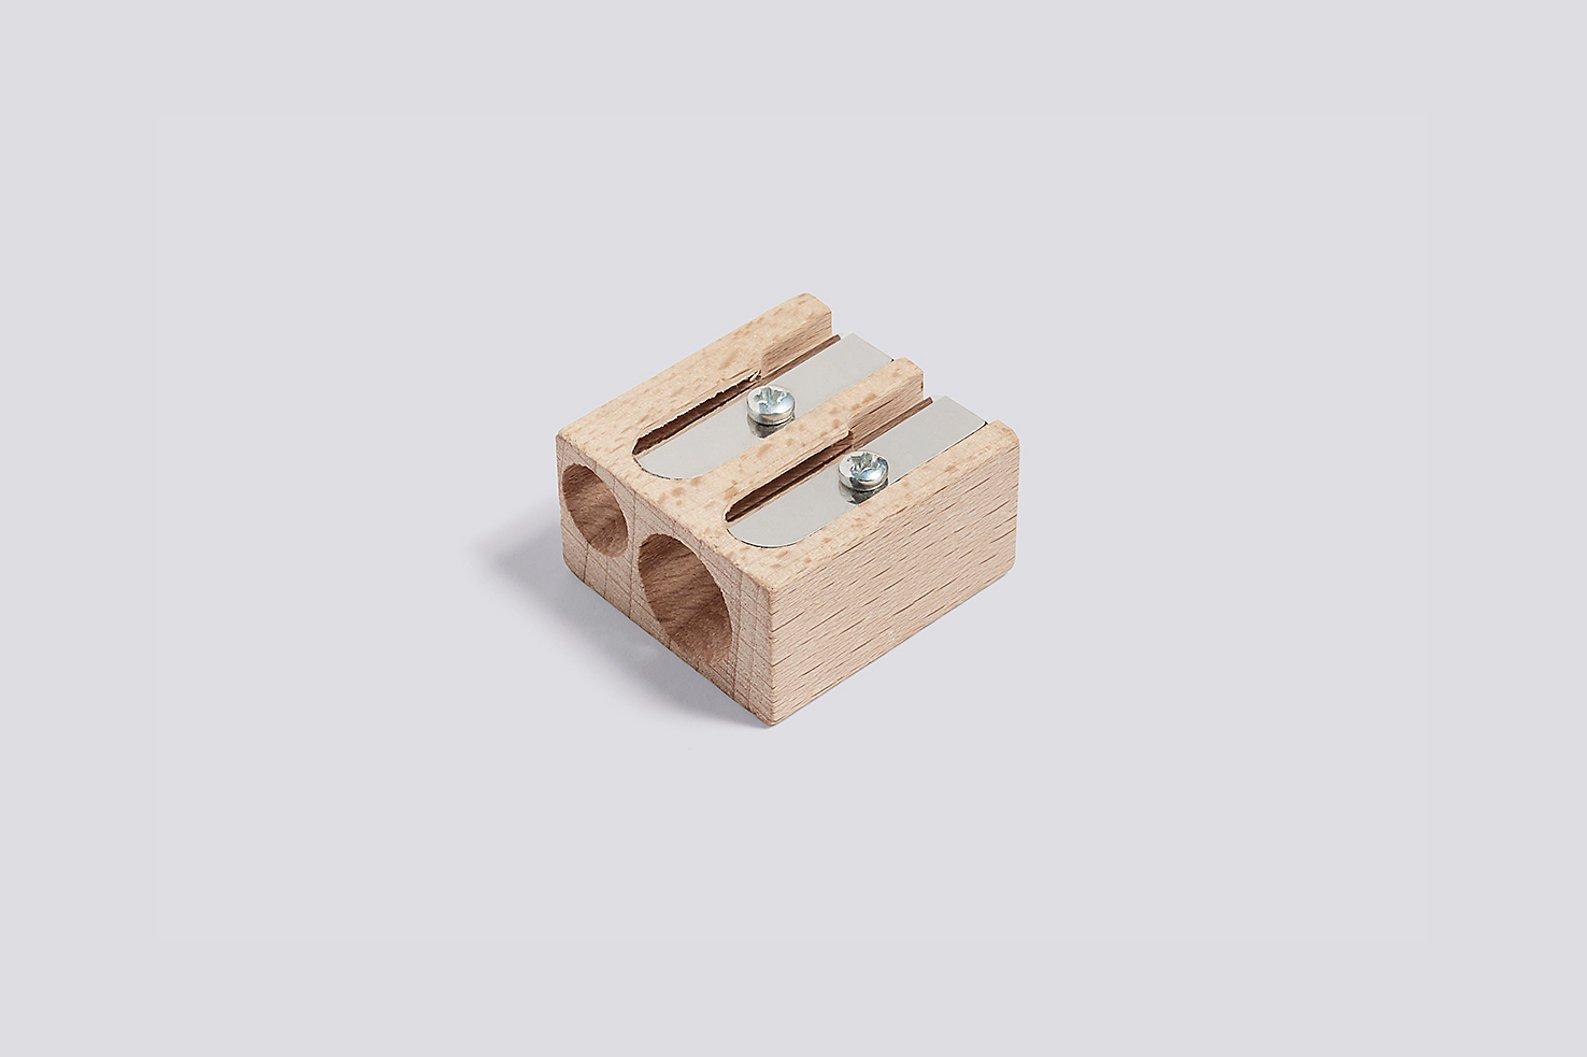 Hay Point Pencil Sharpener